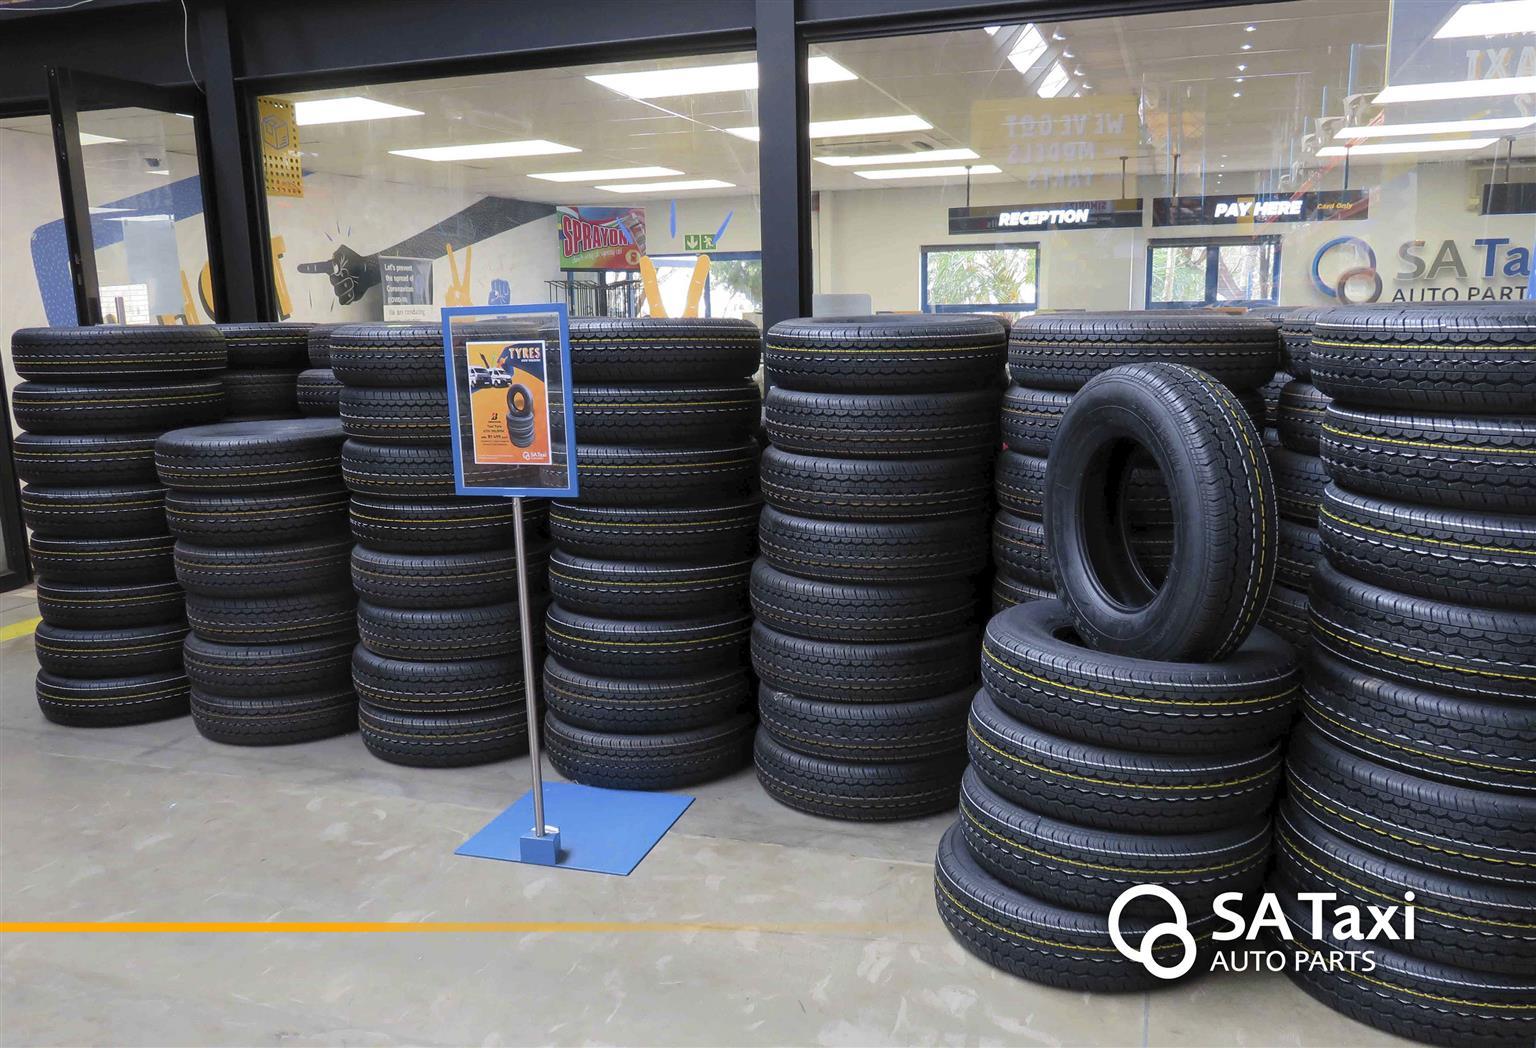 Bridgestone 613V 195/R15C Taxi Tyre - SA Taxi Auto Parts